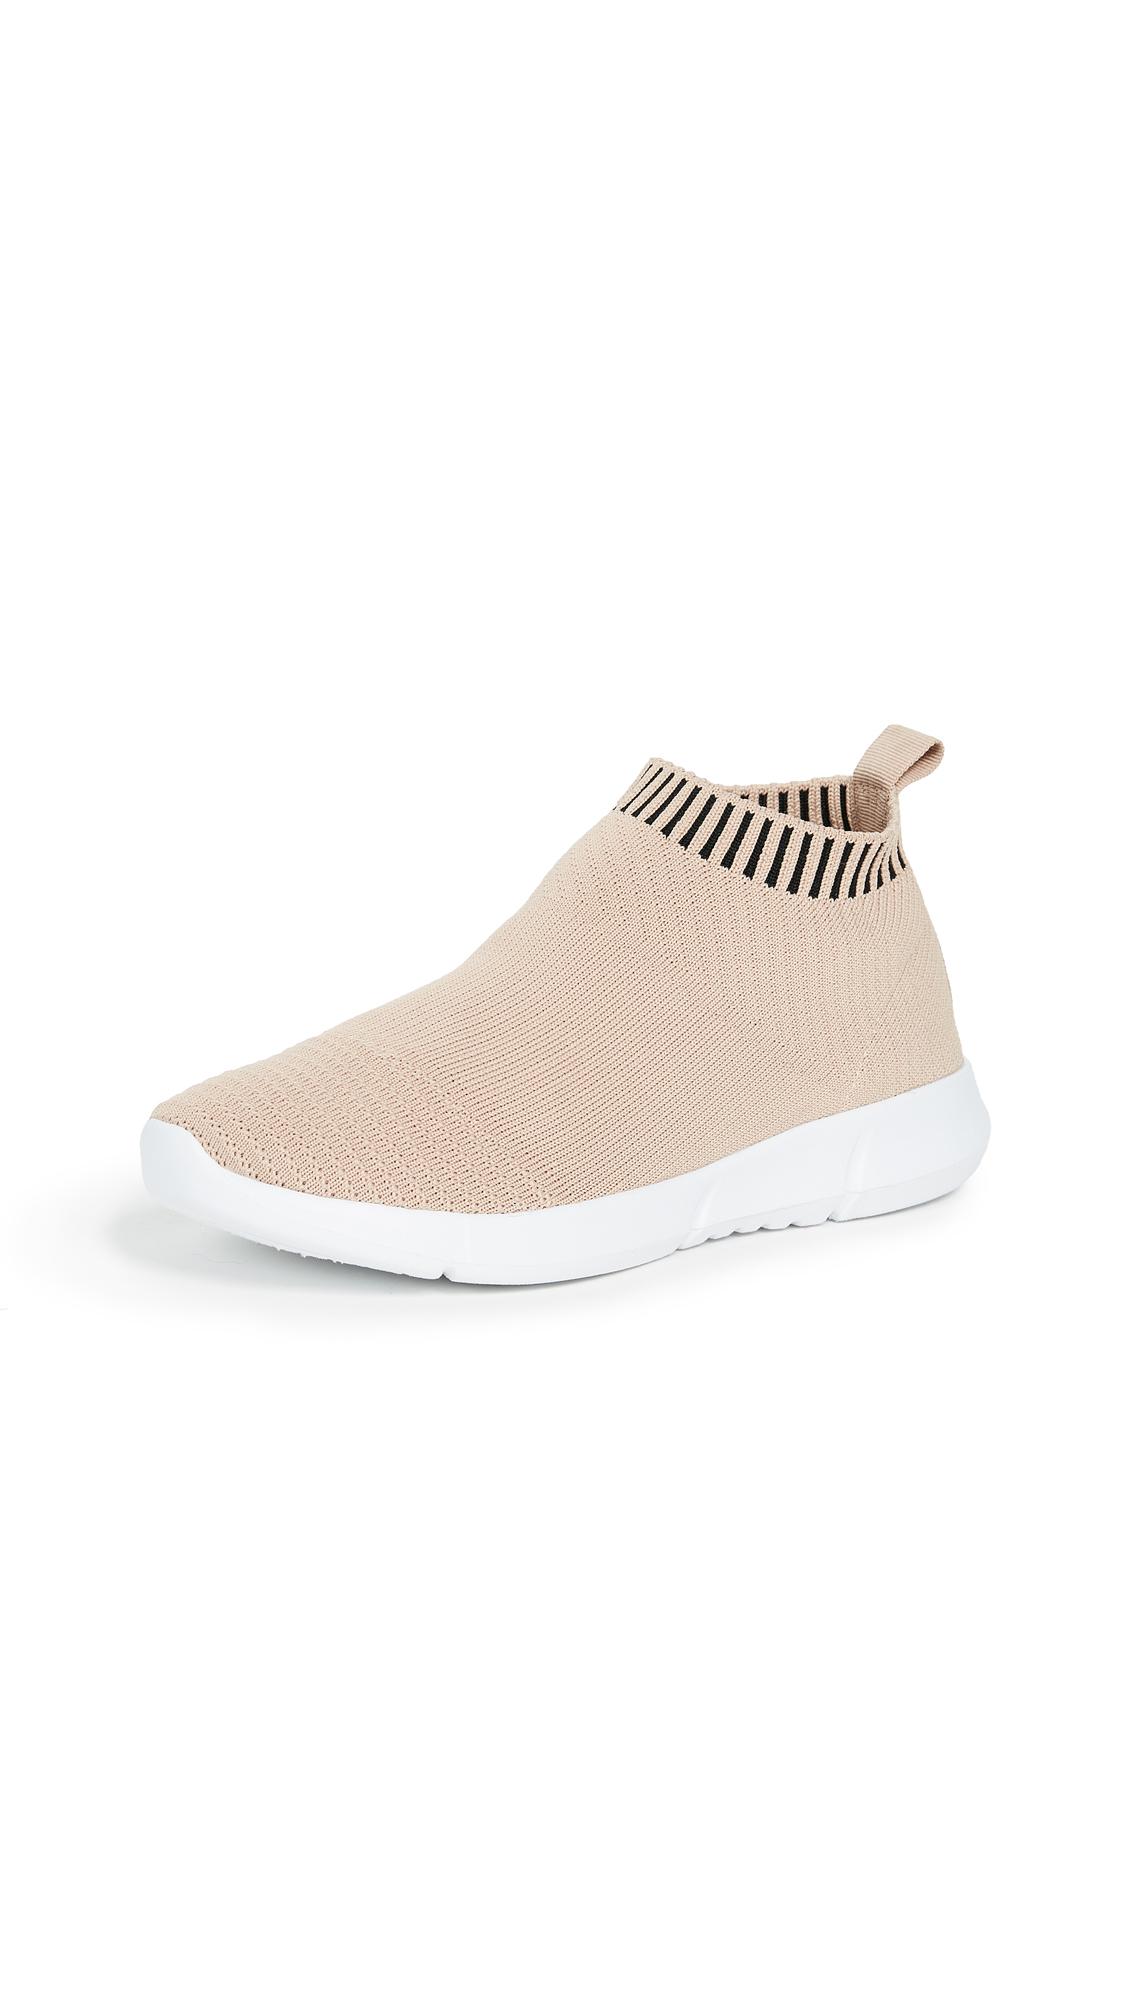 Steven Fabs Knit Jogger Sneakers - Blush